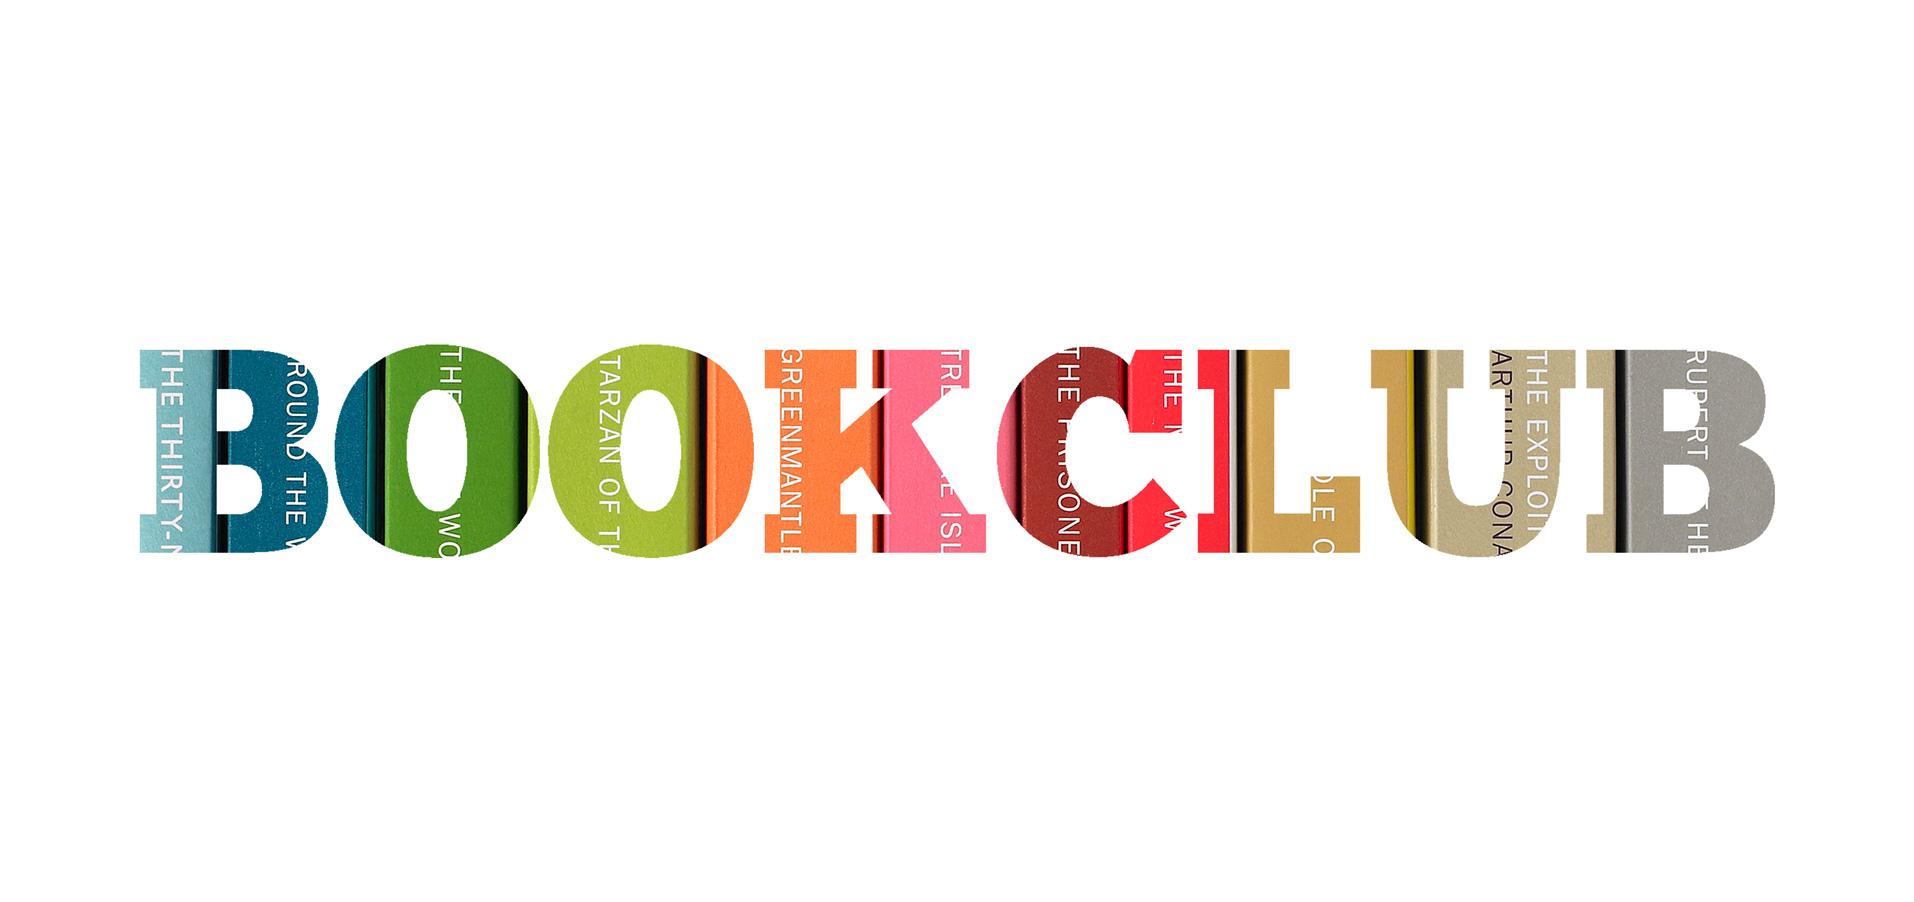 Book-club-graphic-1.jpg